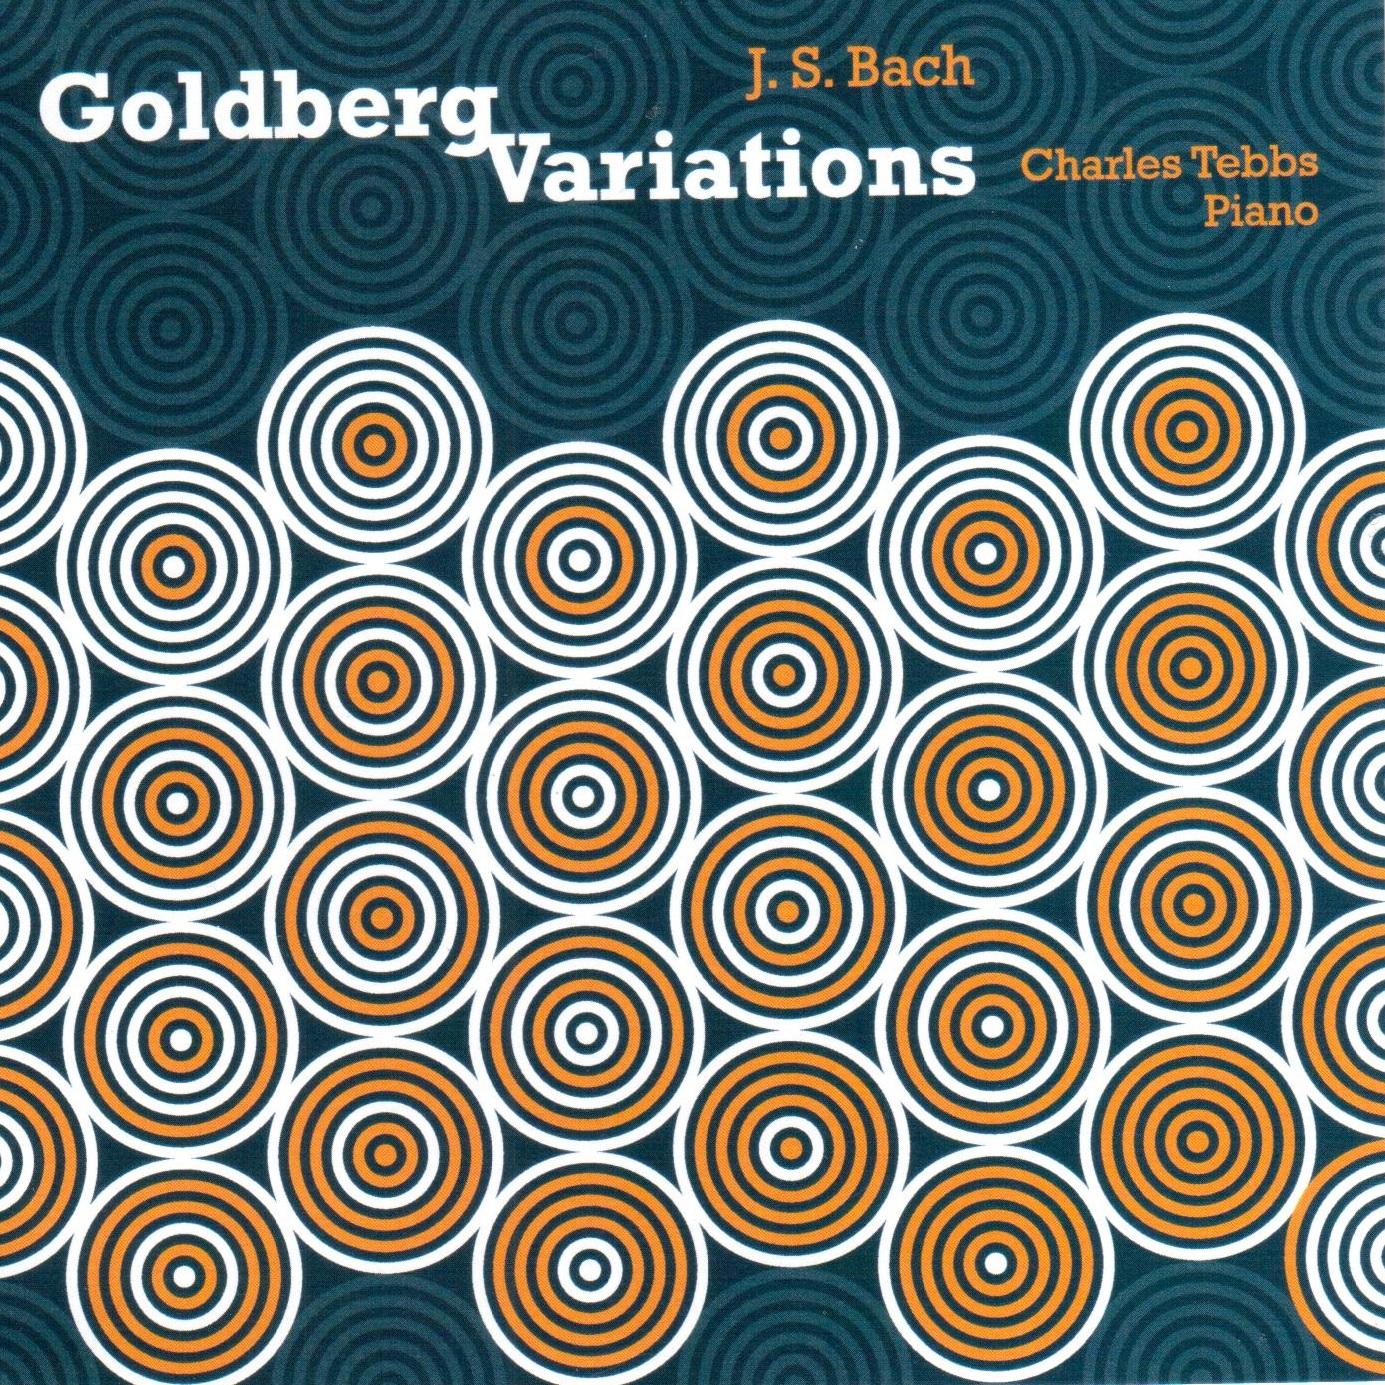 Golberg CD close